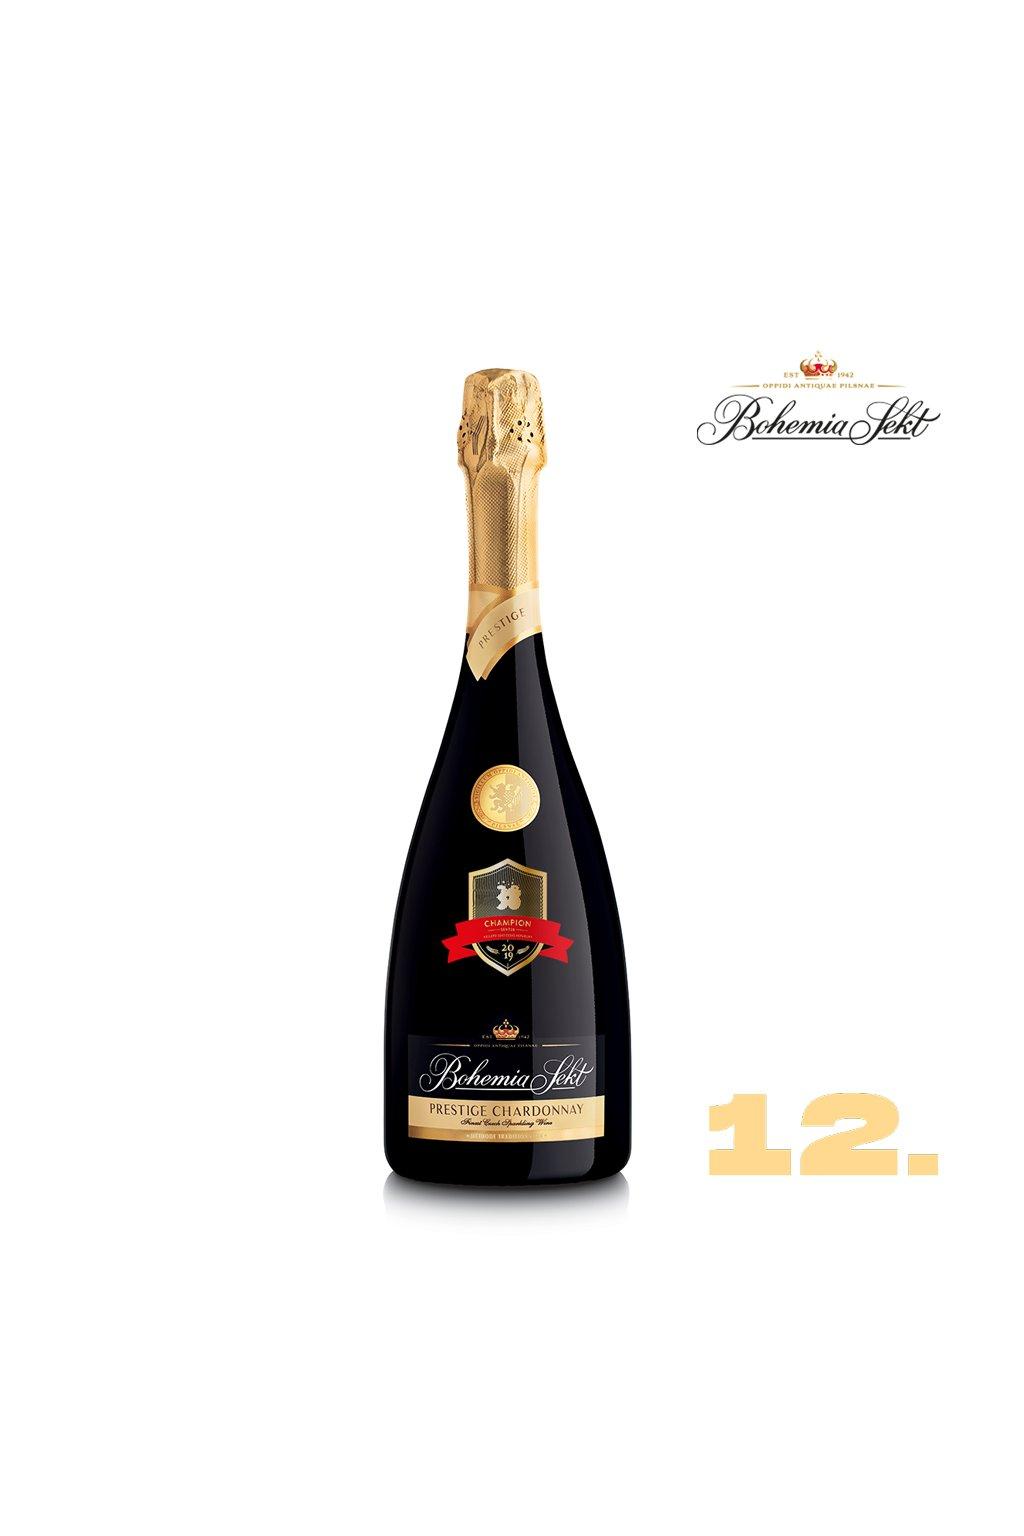 12 Bohemia Sekt Prestige Chardonnay brut